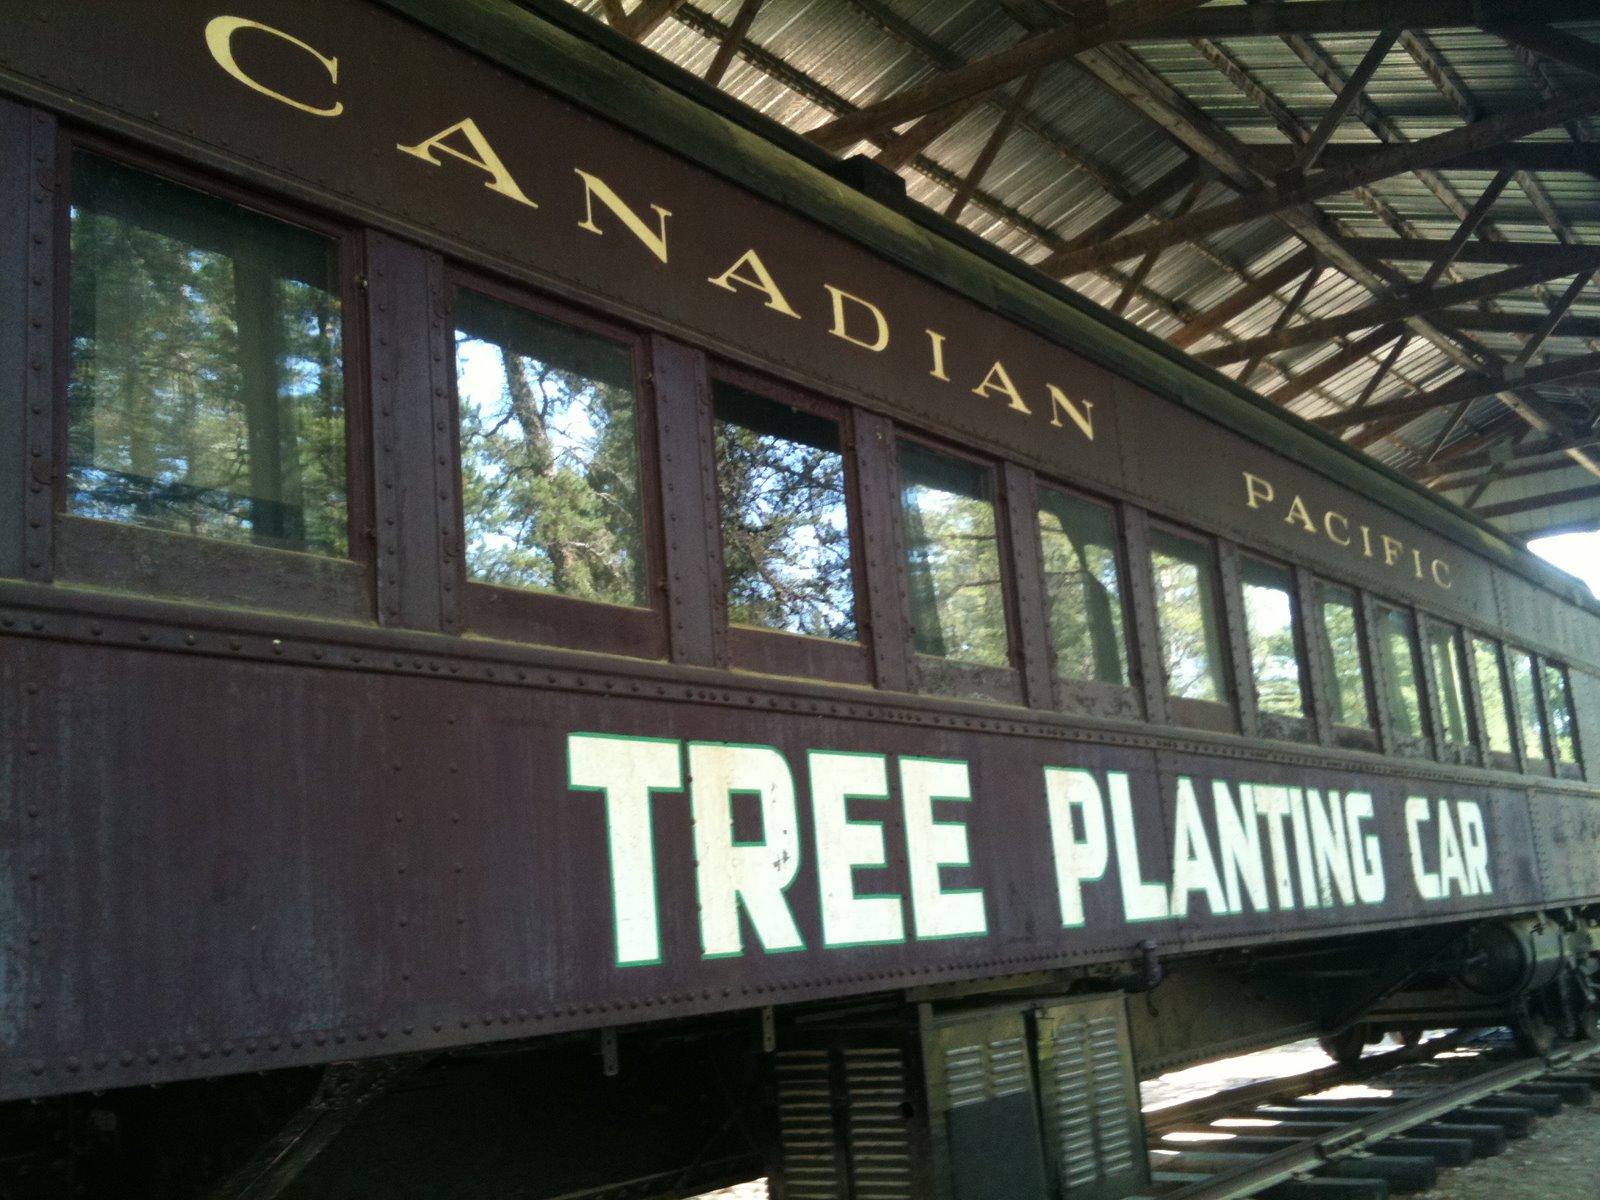 Tree Planting Car